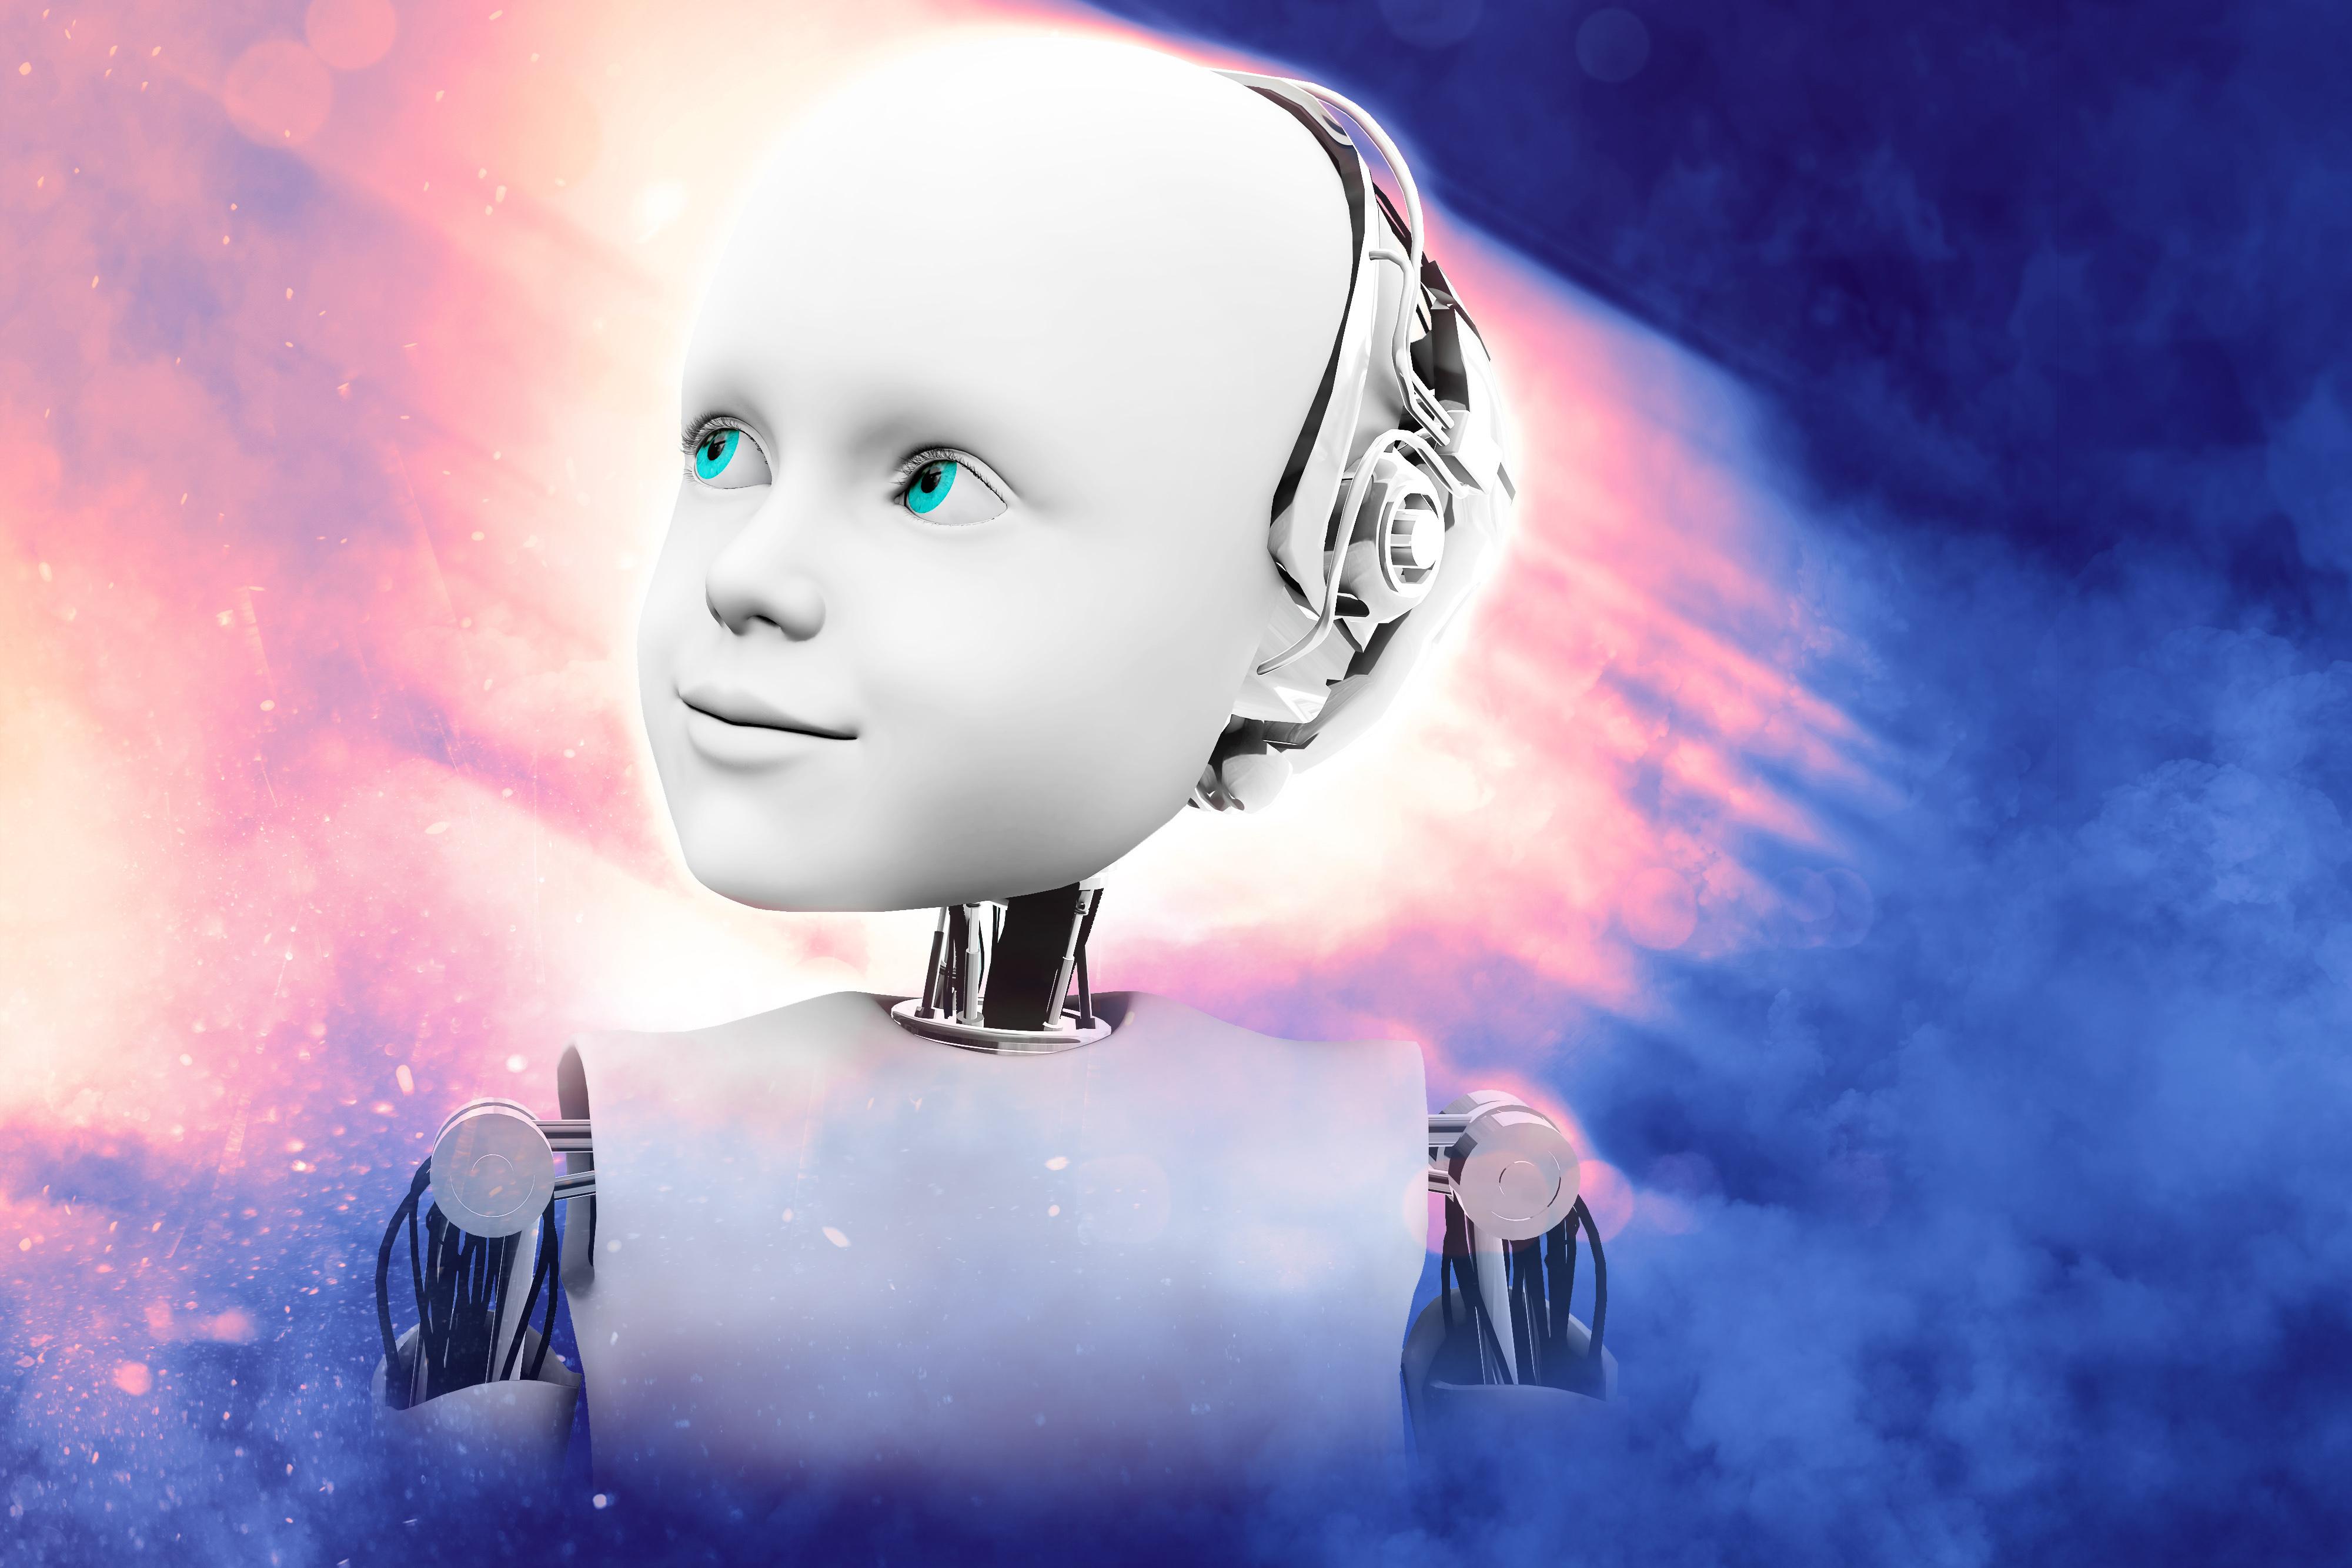 AI,人工智能,AI,爸爸,吴甘沙,梁家恩,俞凯,周曦,徐立,王俊,戴文渊,余凯,人工智能